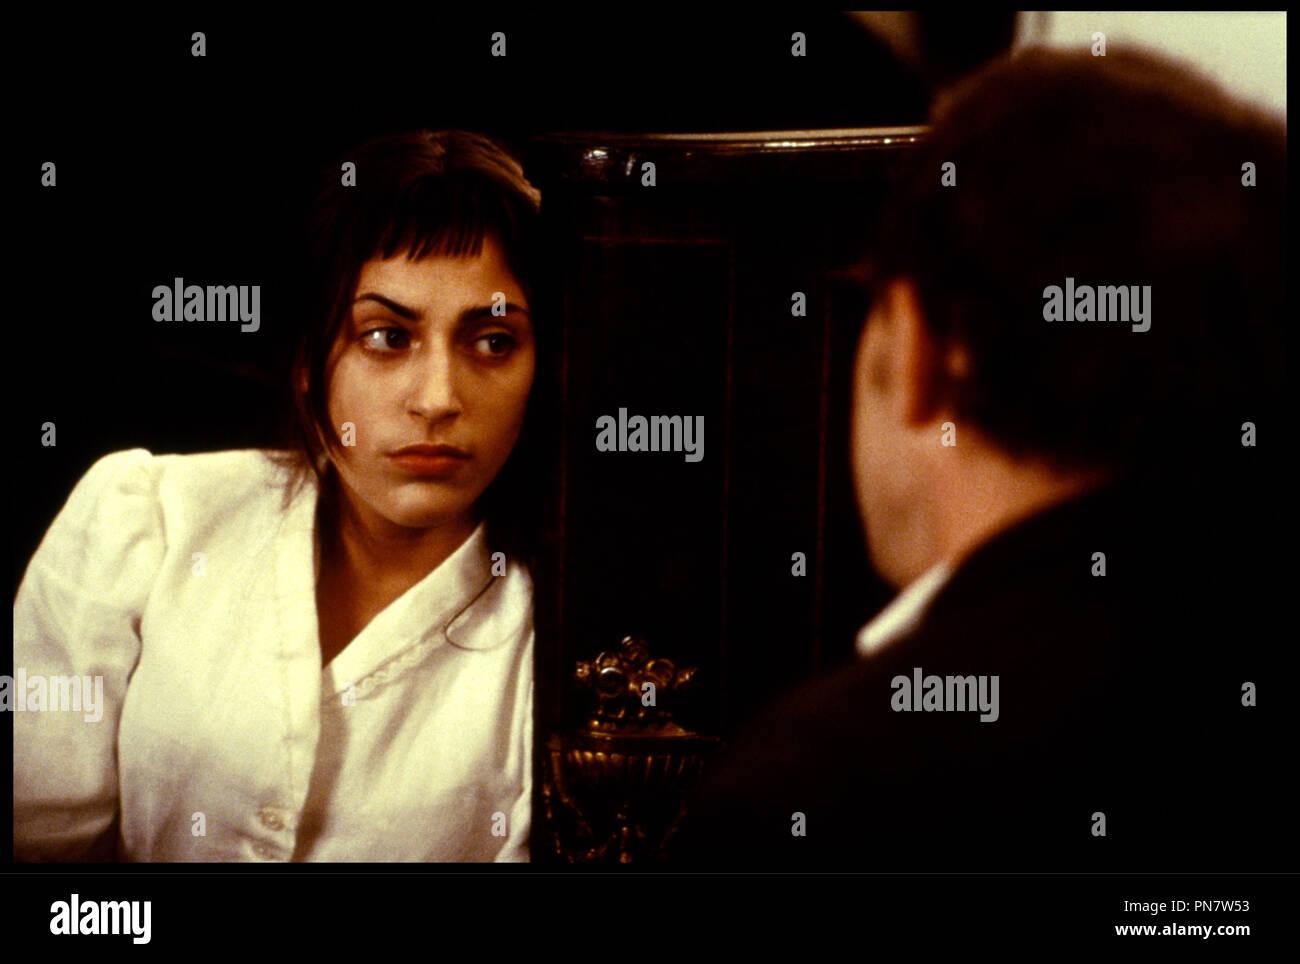 Prod DB ©ÊWhy Not Prod. /DR ESTHER KAHN (ESTHER KAHN) de Arnaud Desplechin 2000 USA avec Summer Phoenix - Stock Image